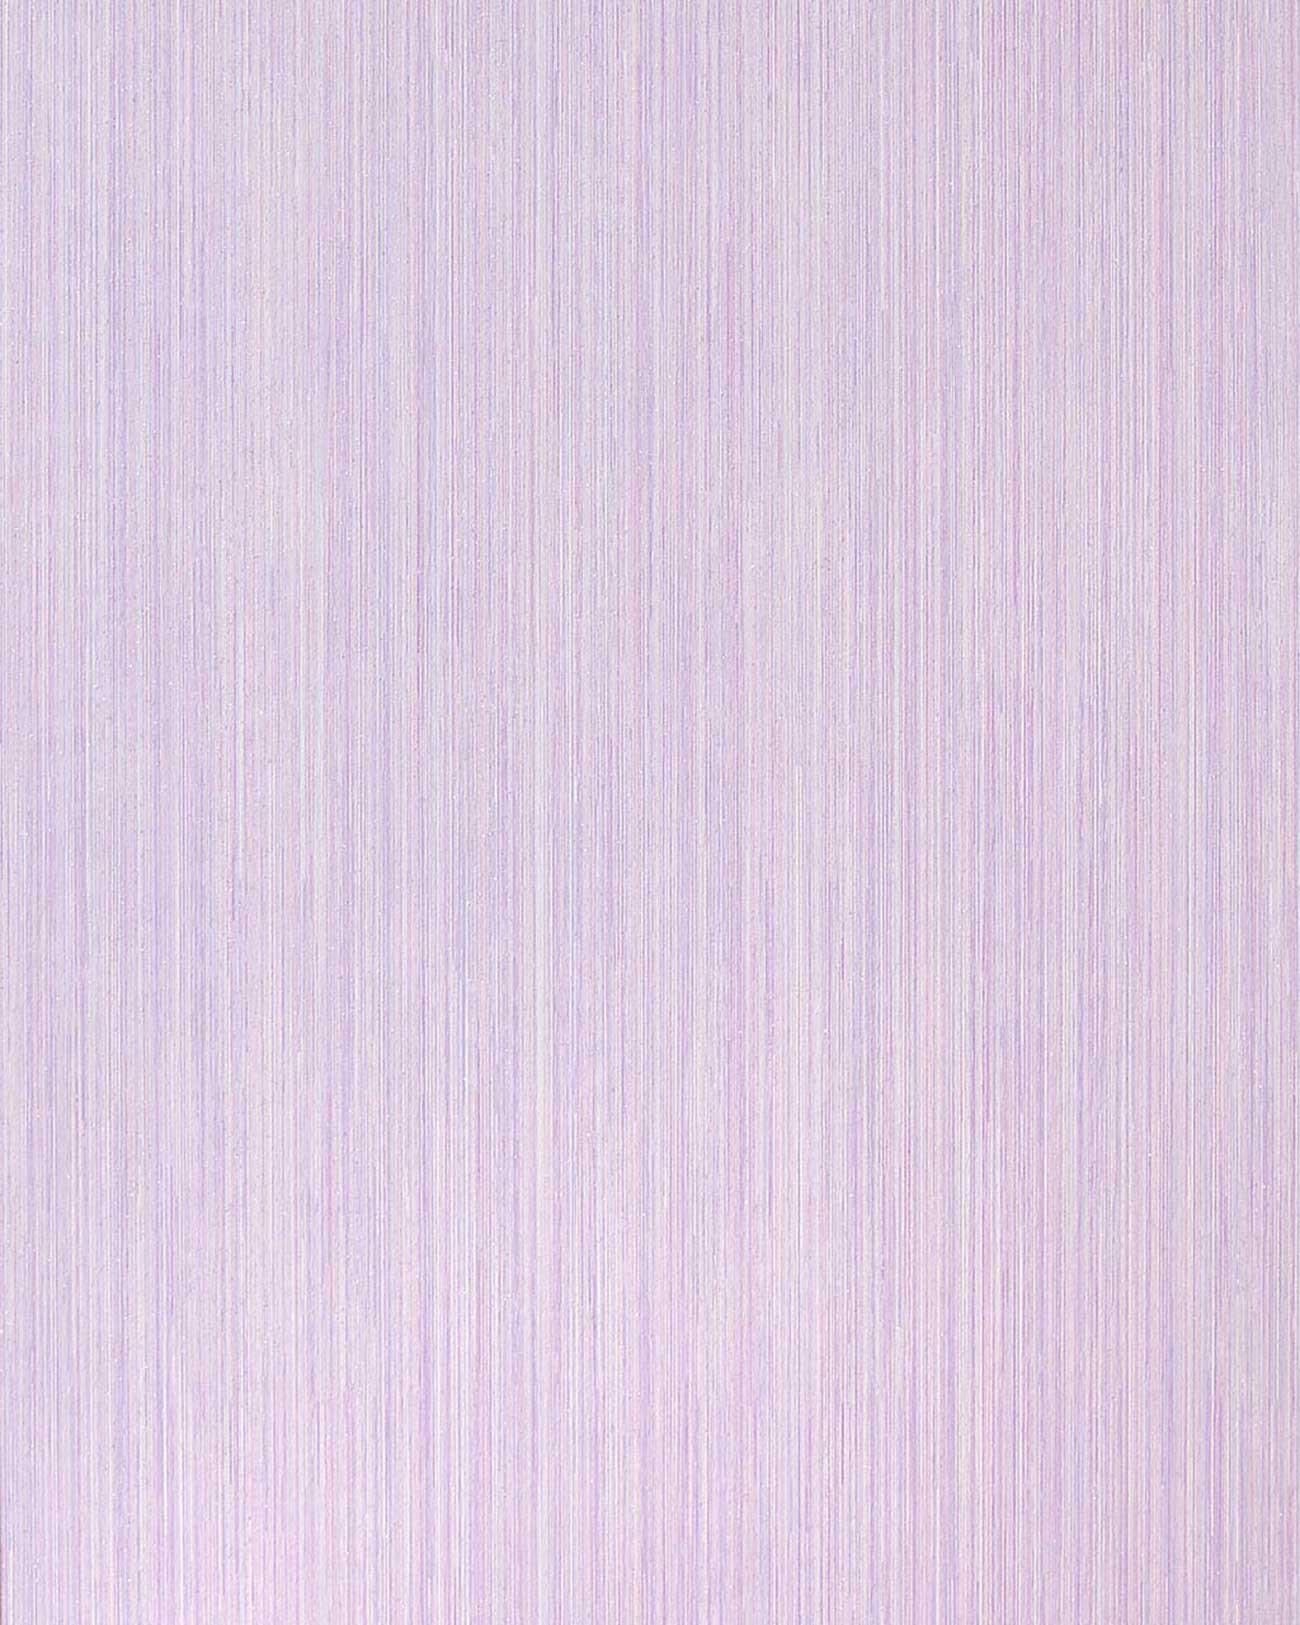 Tapete Violett Gestreift : Tapete Vinyl rot-violett wei? violett silber kaufen bei Hood.de